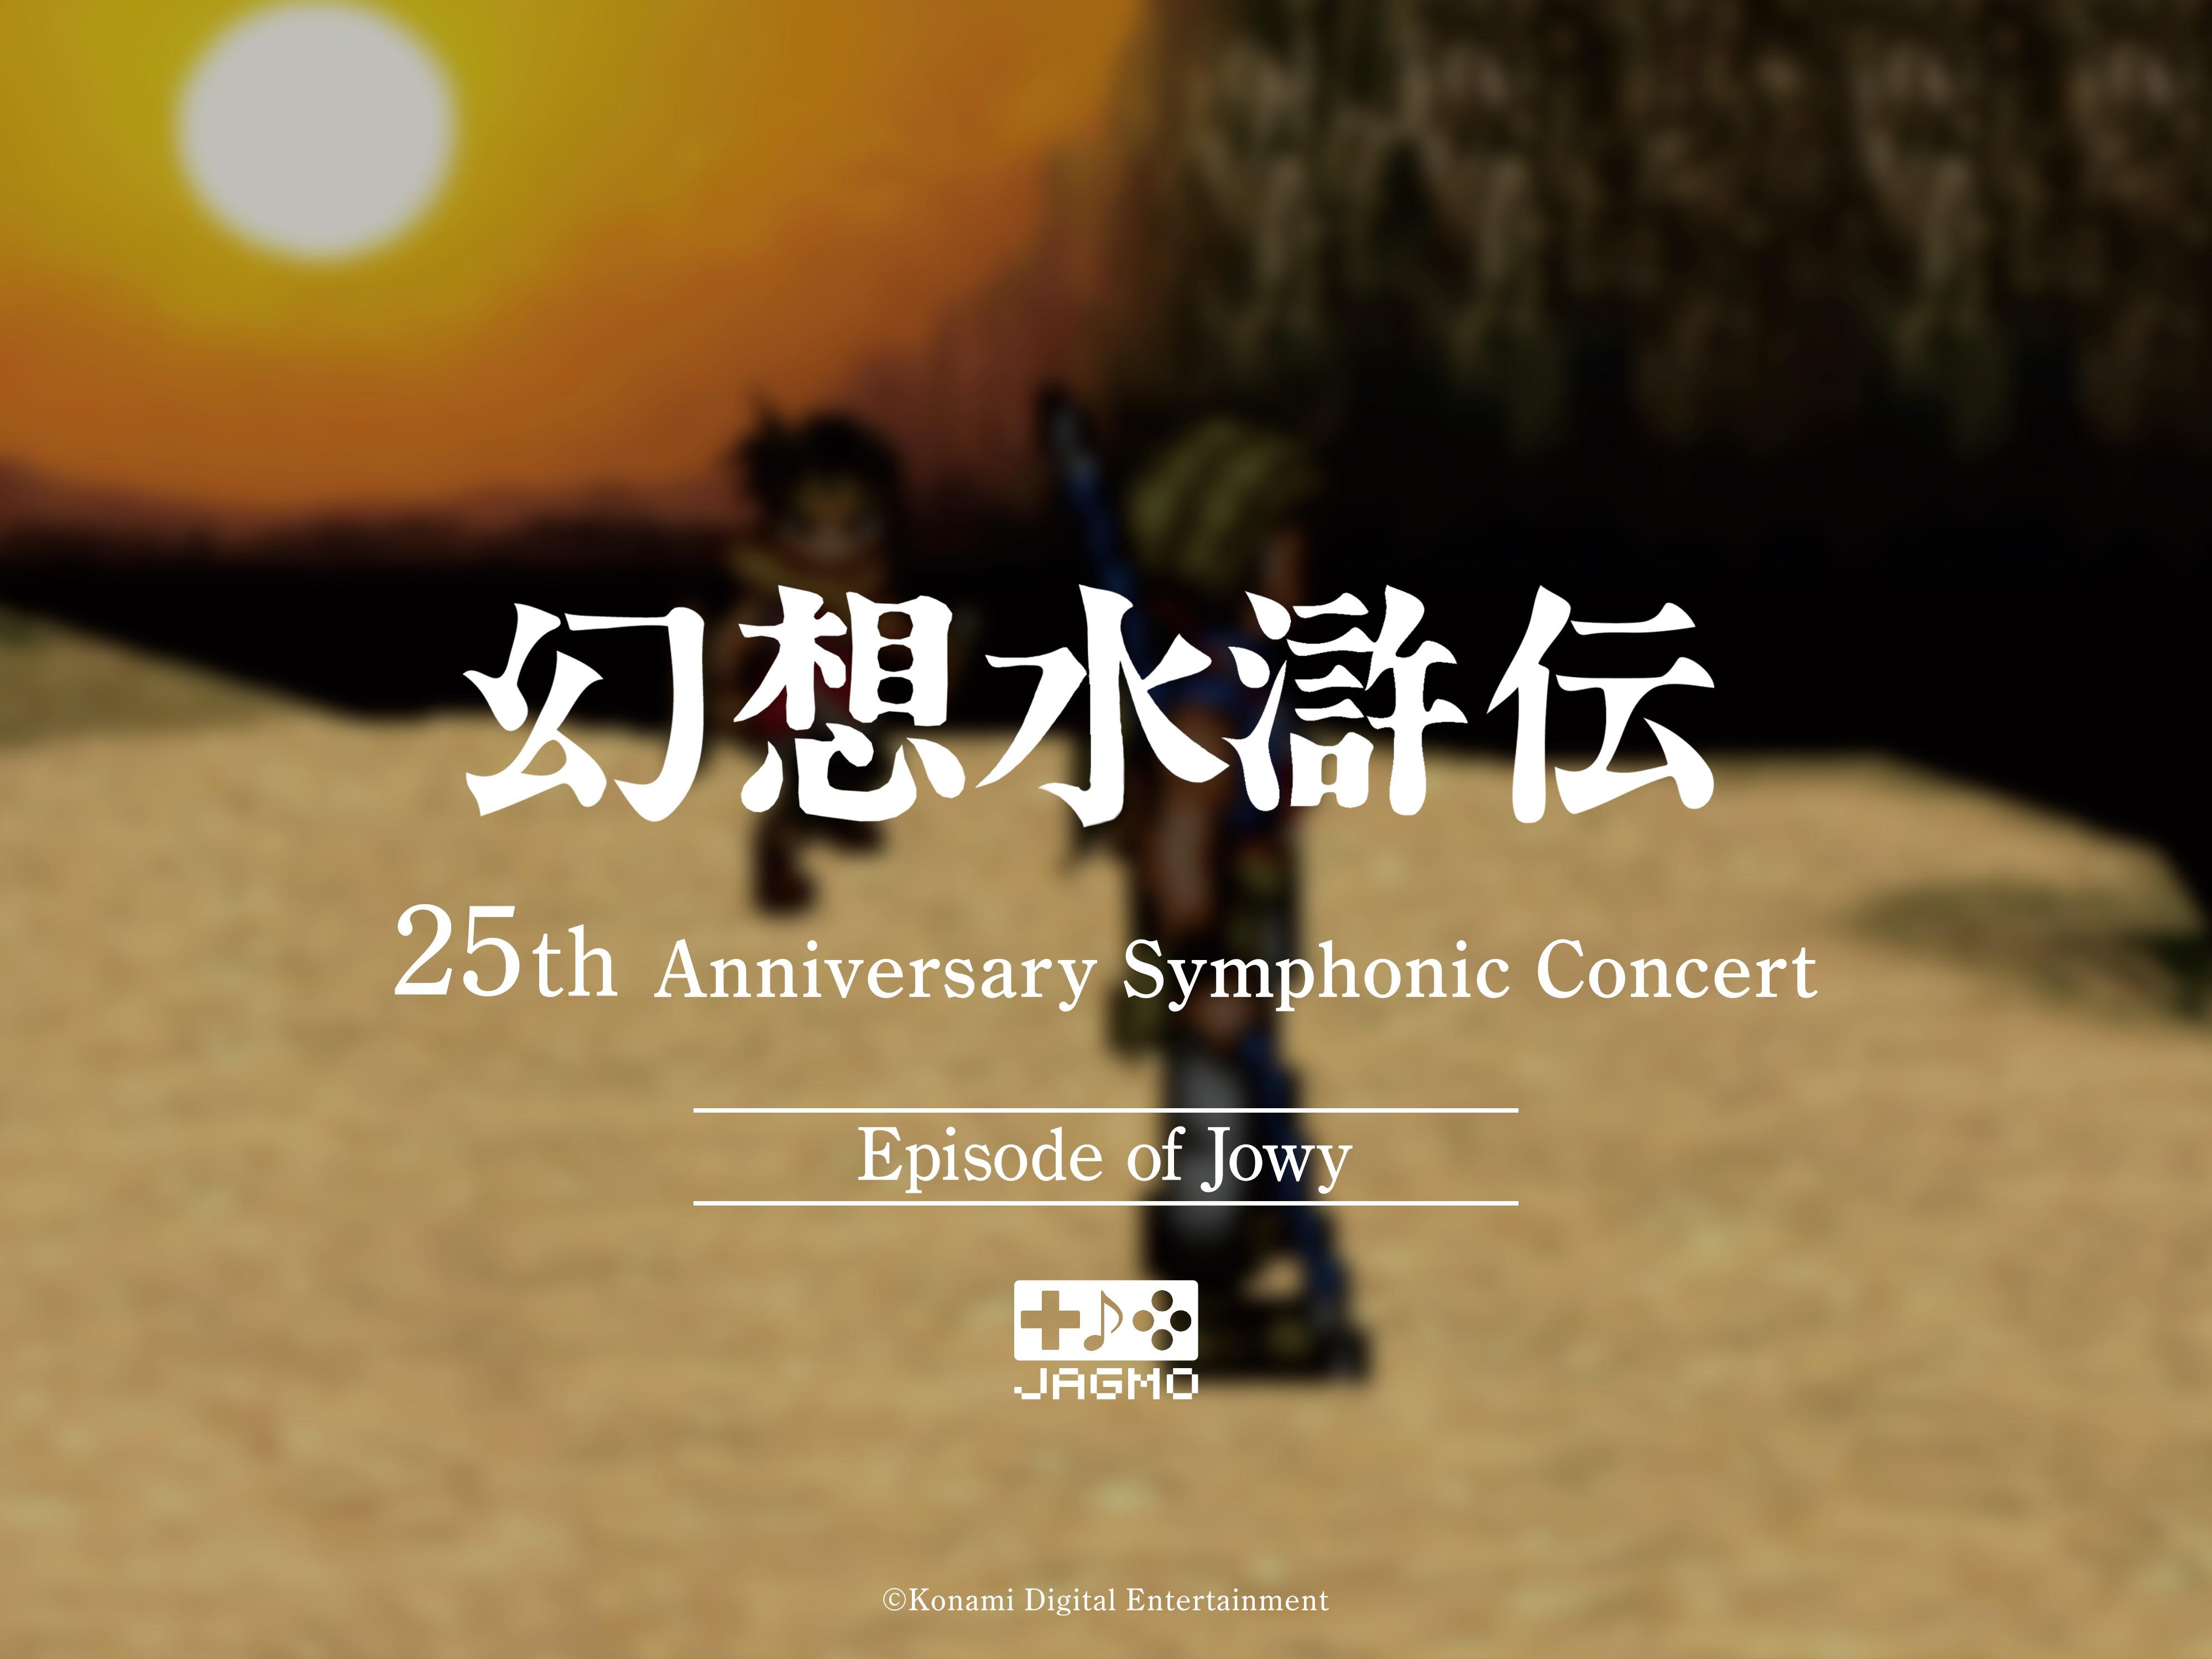 幻想水滸伝 25th Anniversary Symphonic Concert Online -Episode of Jowy-   演奏:JAGMO 指揮:井田勝大